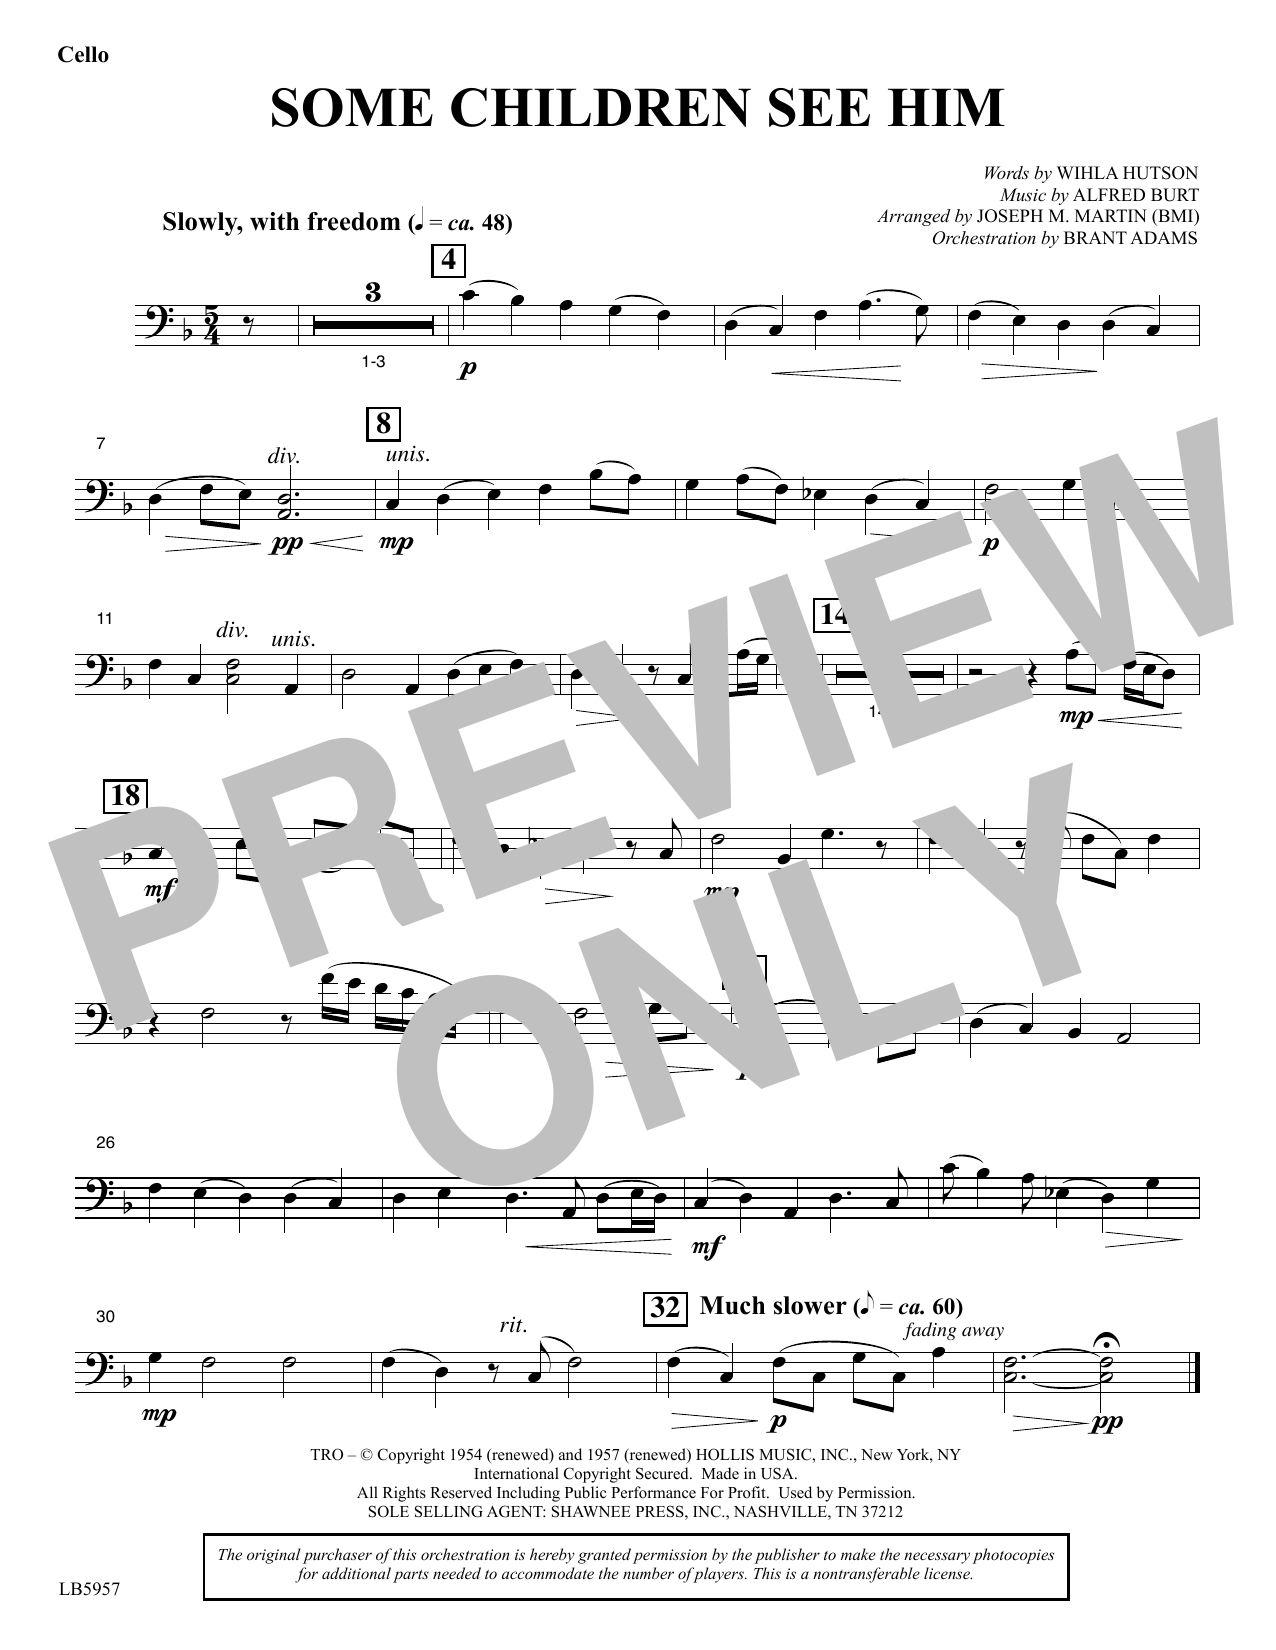 Some Children See Him (arr. Joseph M. Martin) - Cello Sheet Music